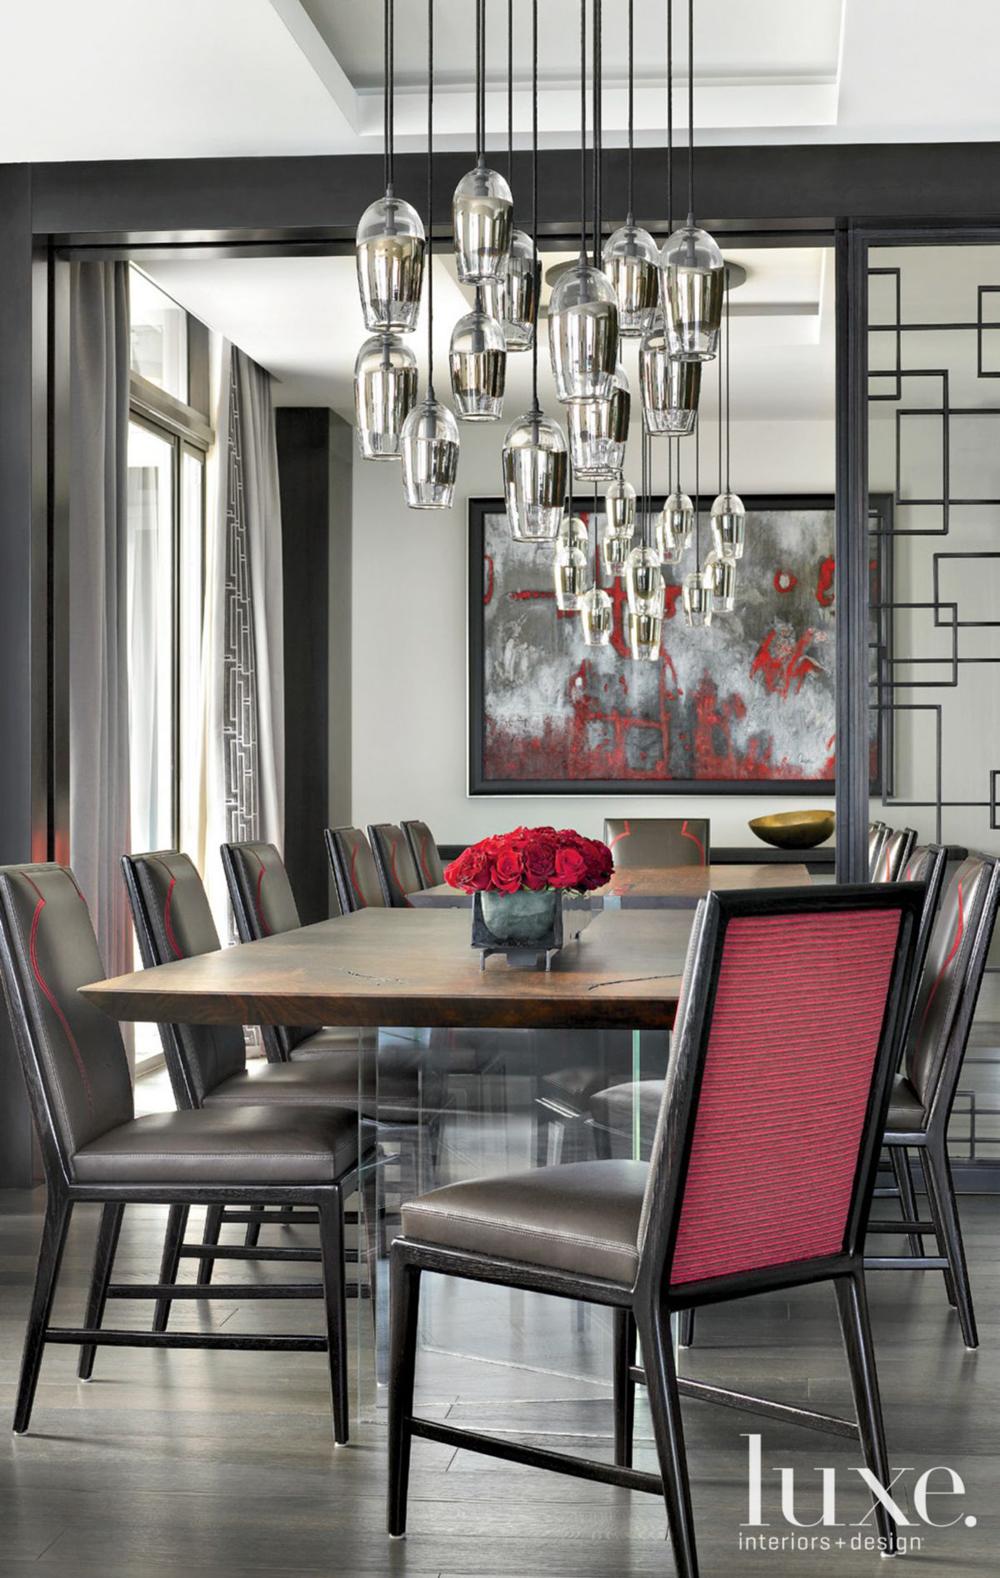 A Waterfront Miami Condominium with Retro Classics